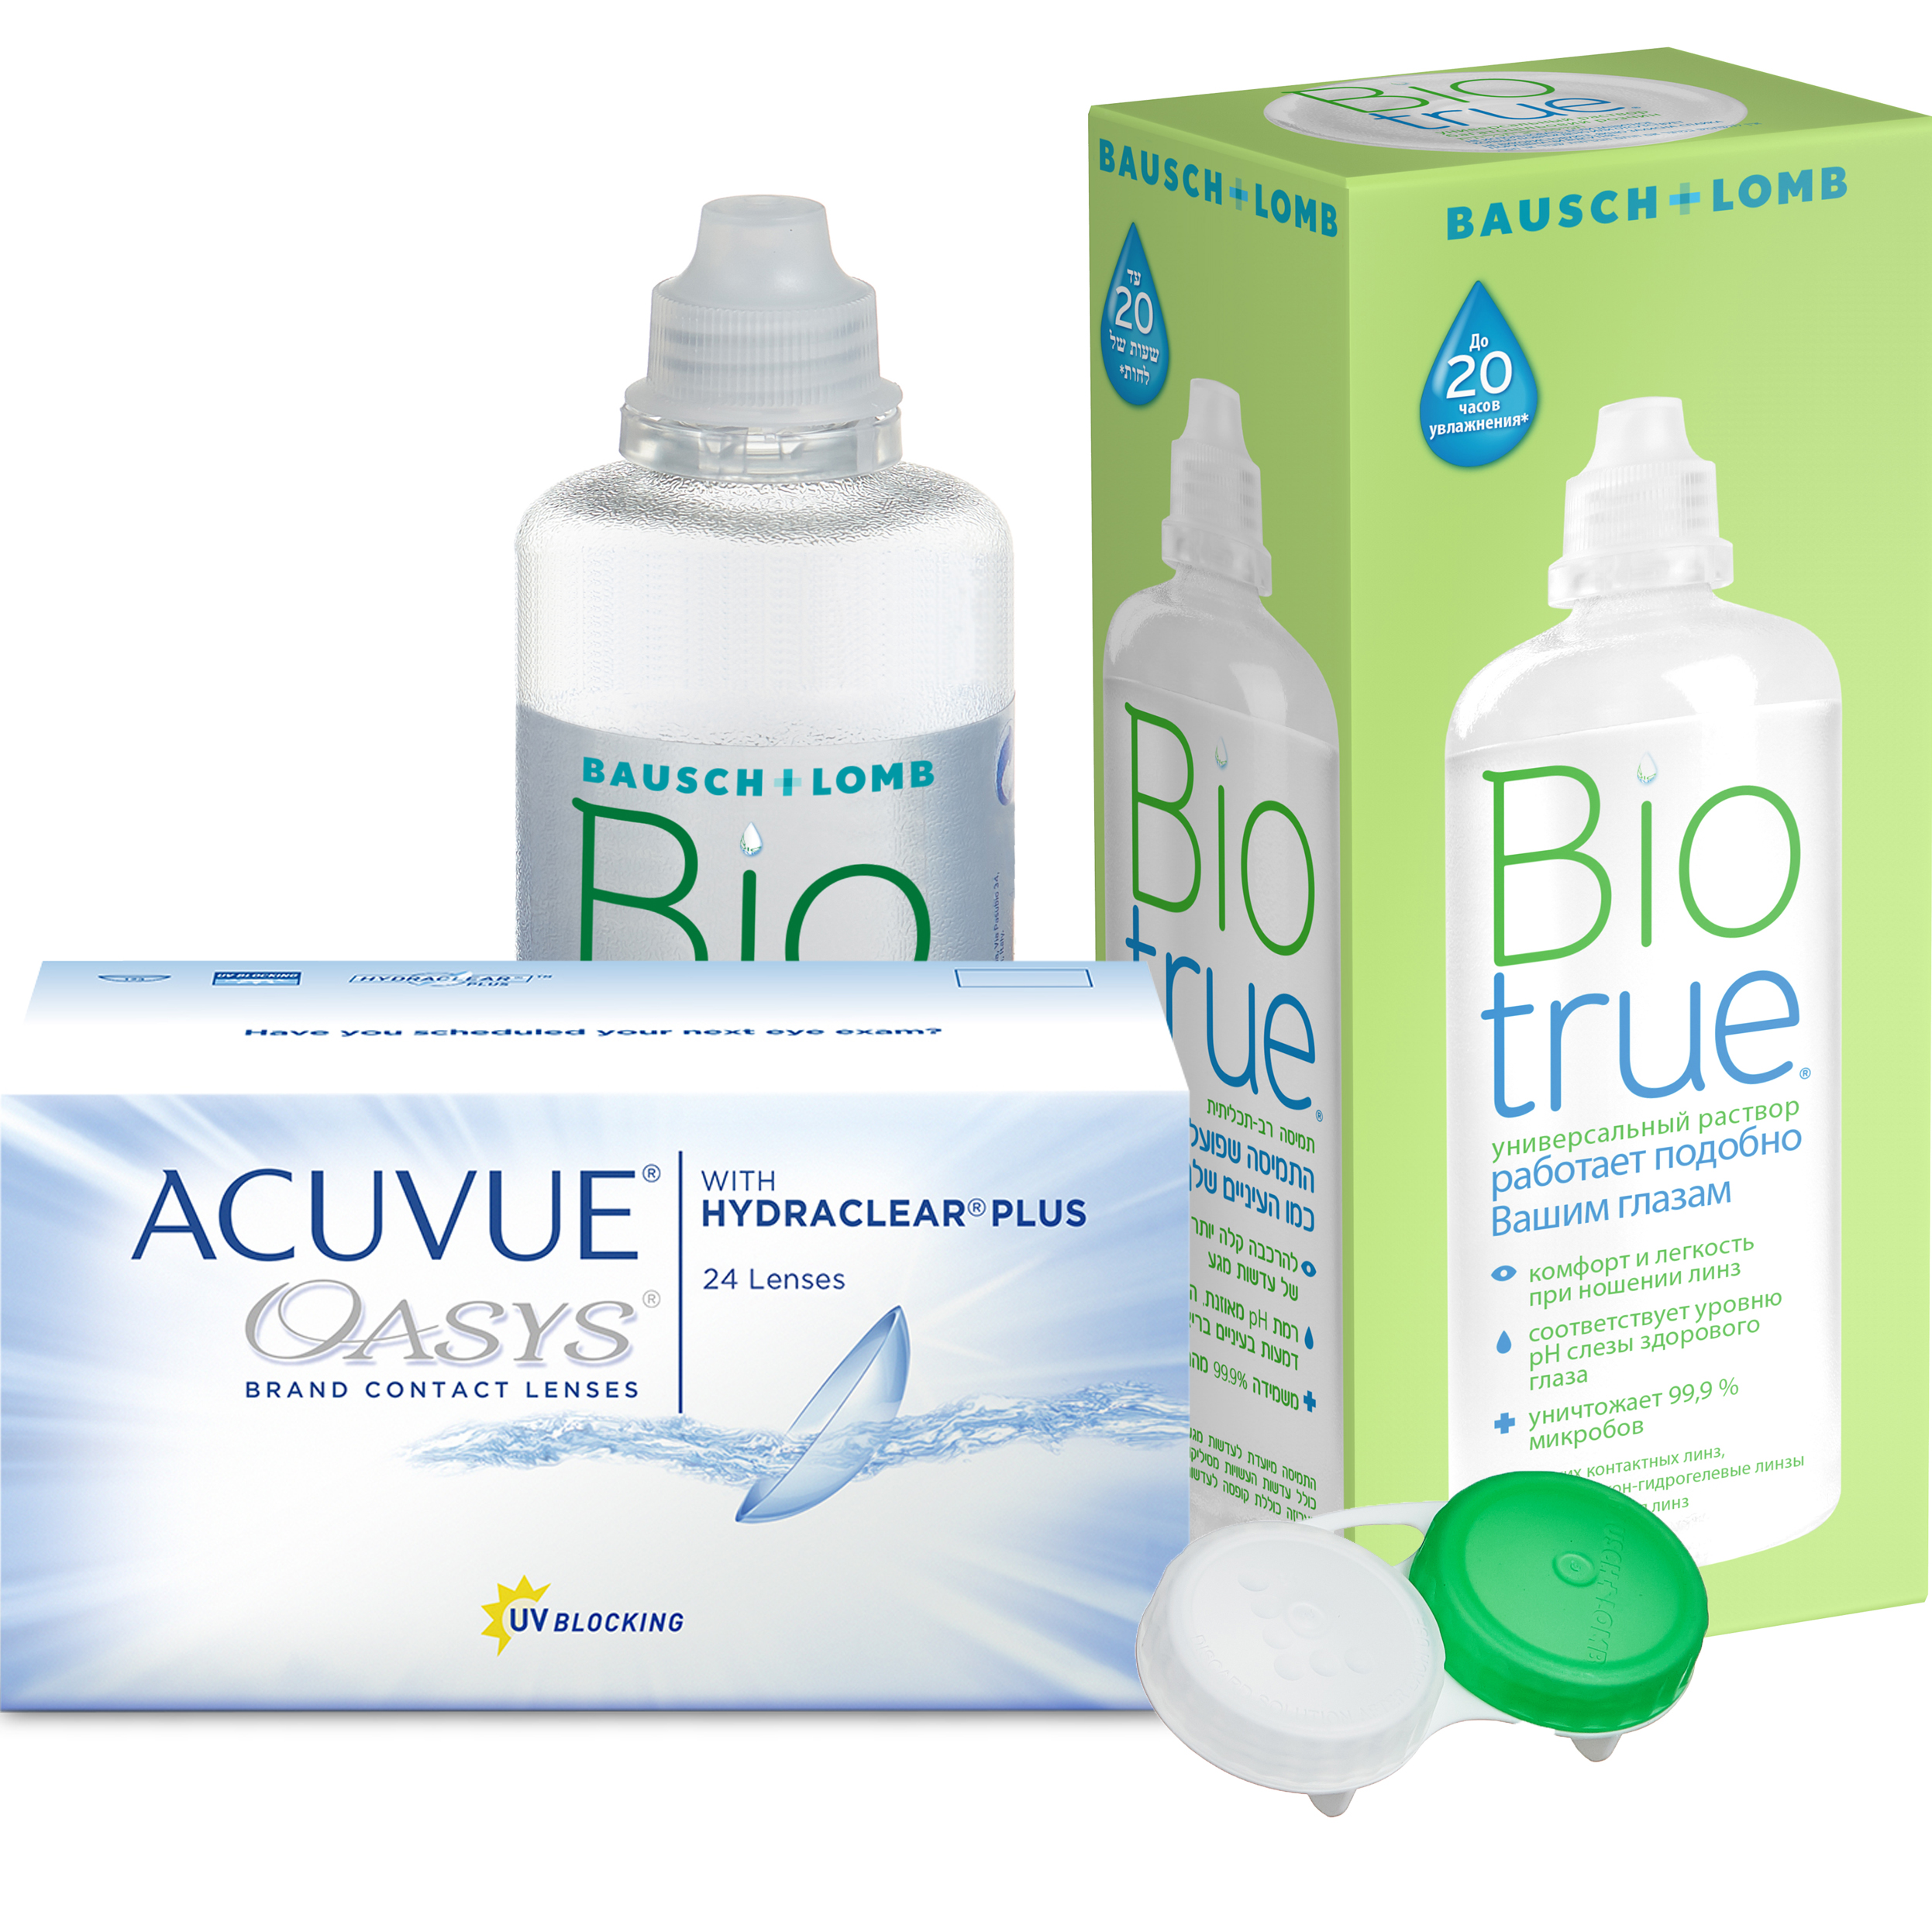 Купить Oasys with Hydraclear Plus 24 линзы + Biotrue, Контактные линзы Acuvue Oasys with Hydraclear Plus 24 линзы R 8.4 +4, 25 + Biotrue 300 мл